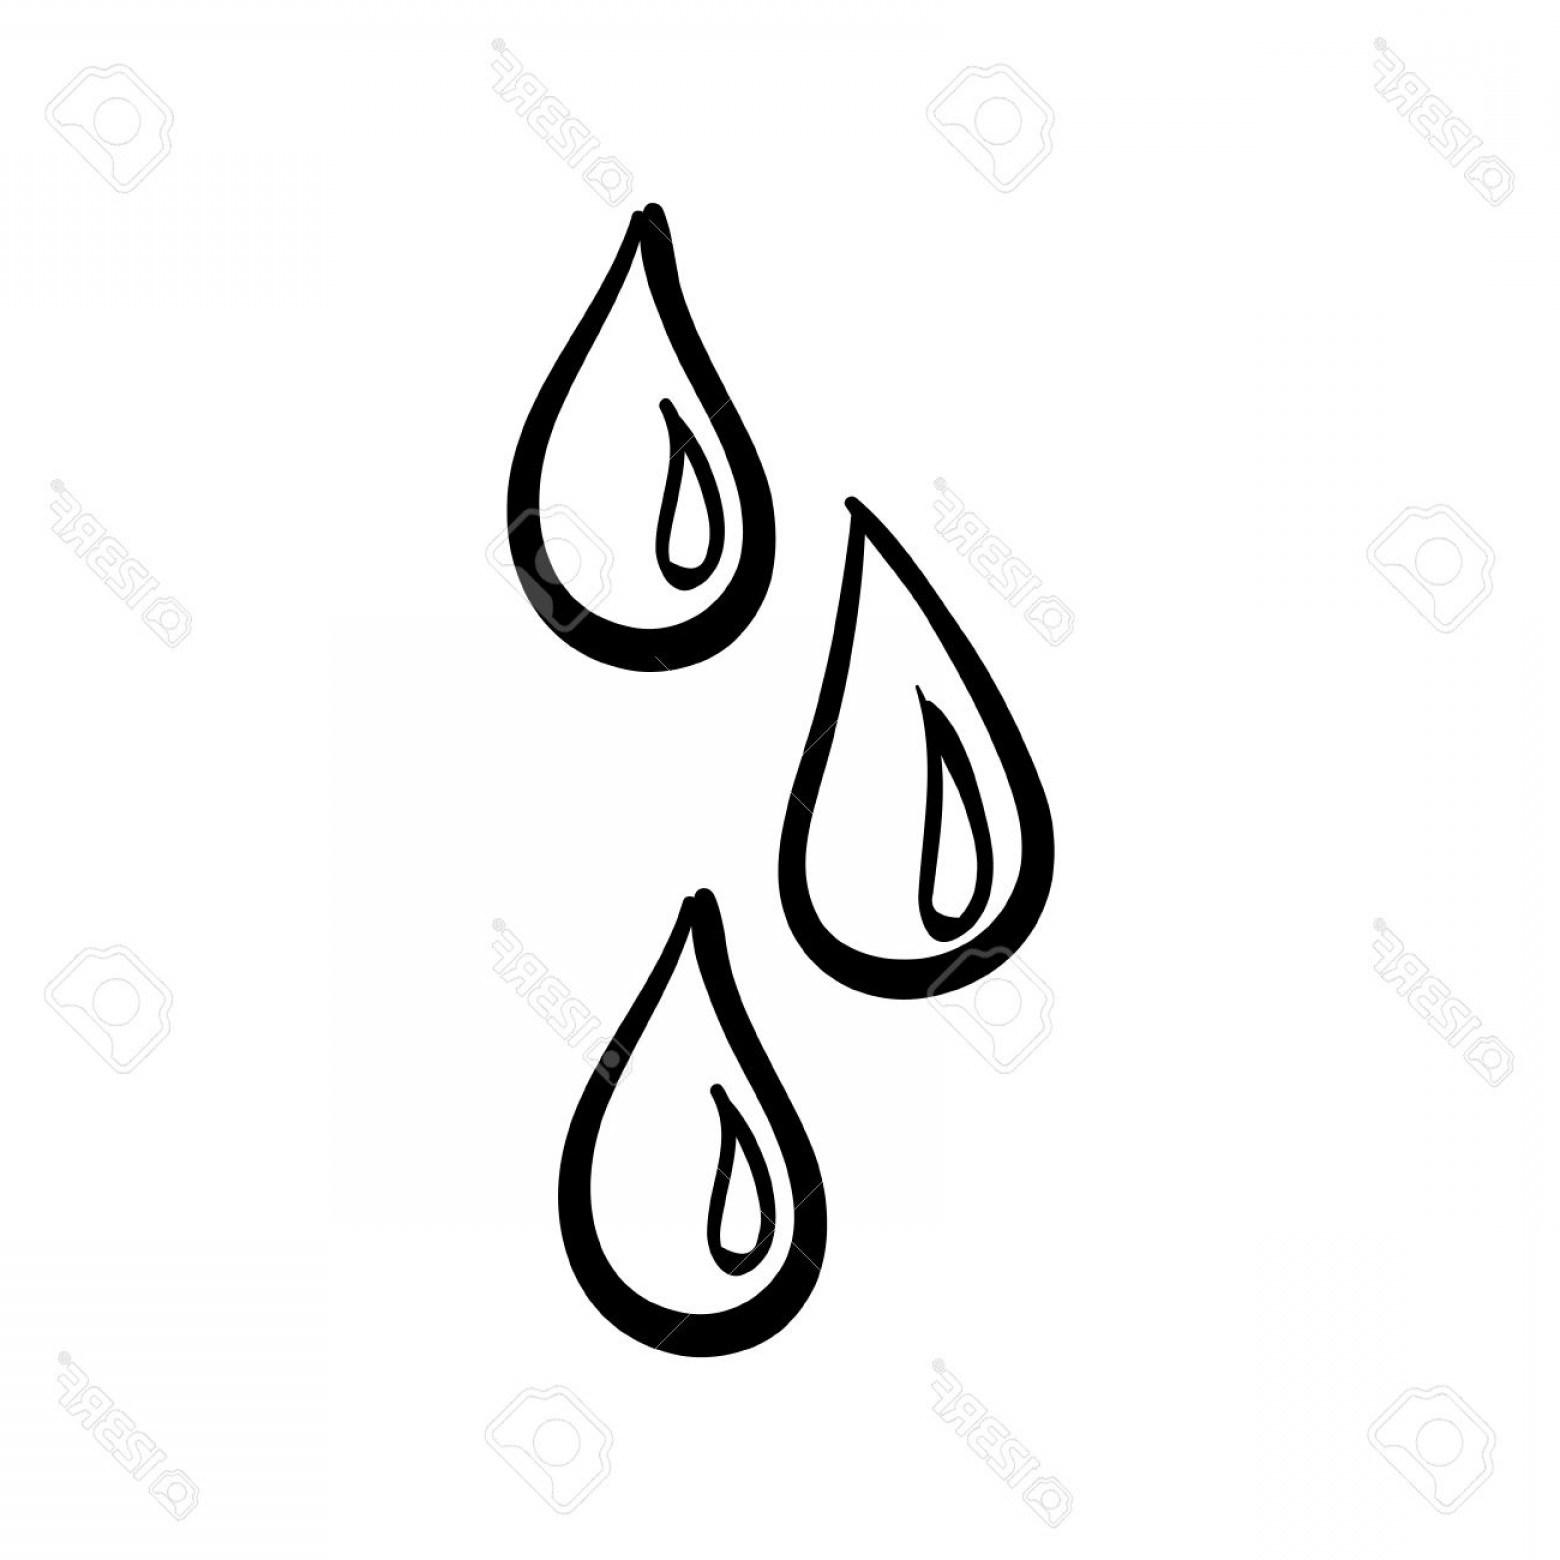 Water droplet clipart black svg freeuse download Water droplets clipart black and white 1 » Clipart Portal svg freeuse download